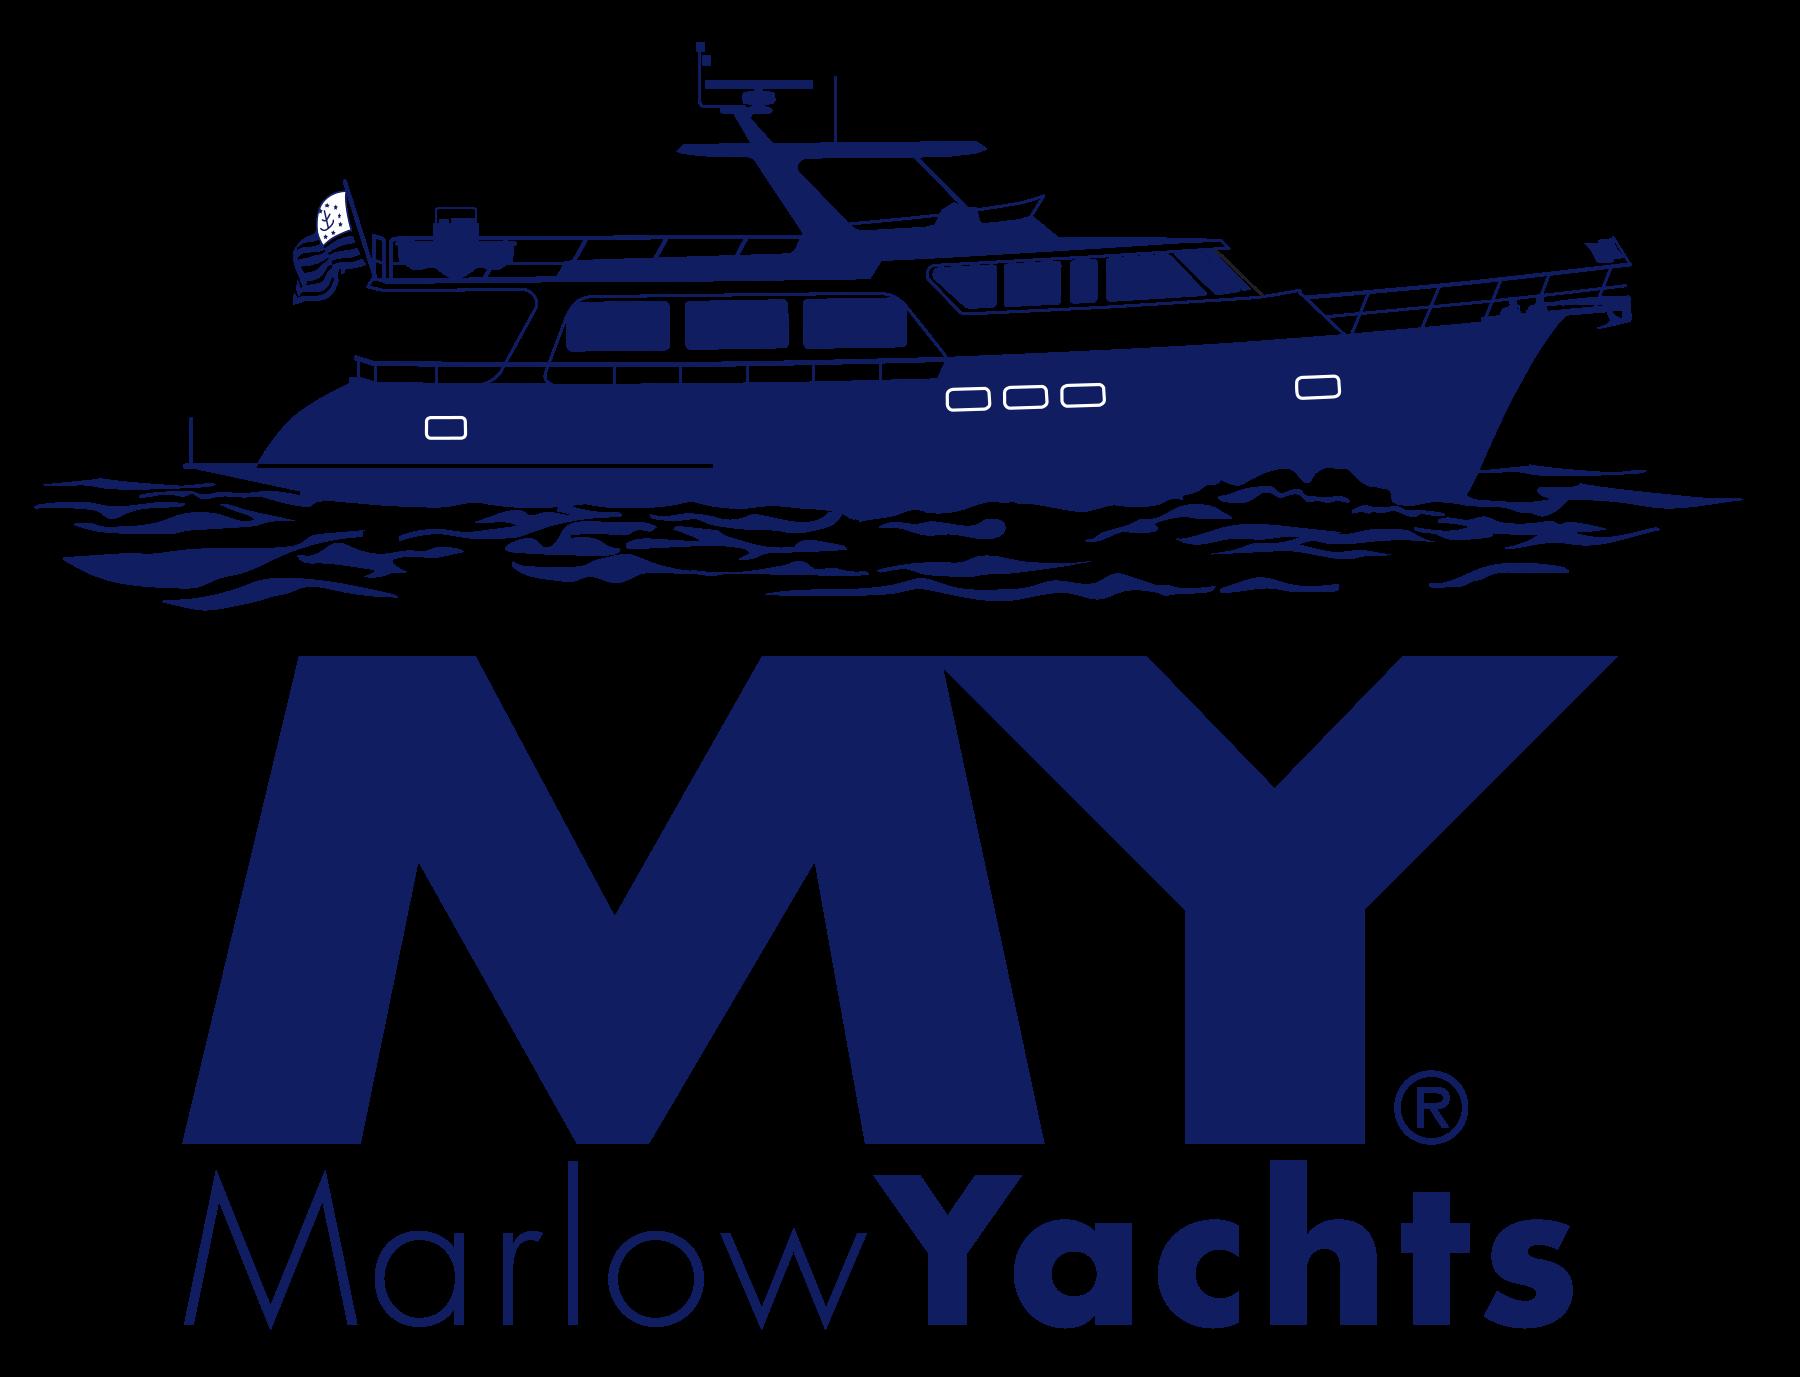 Marlow logo